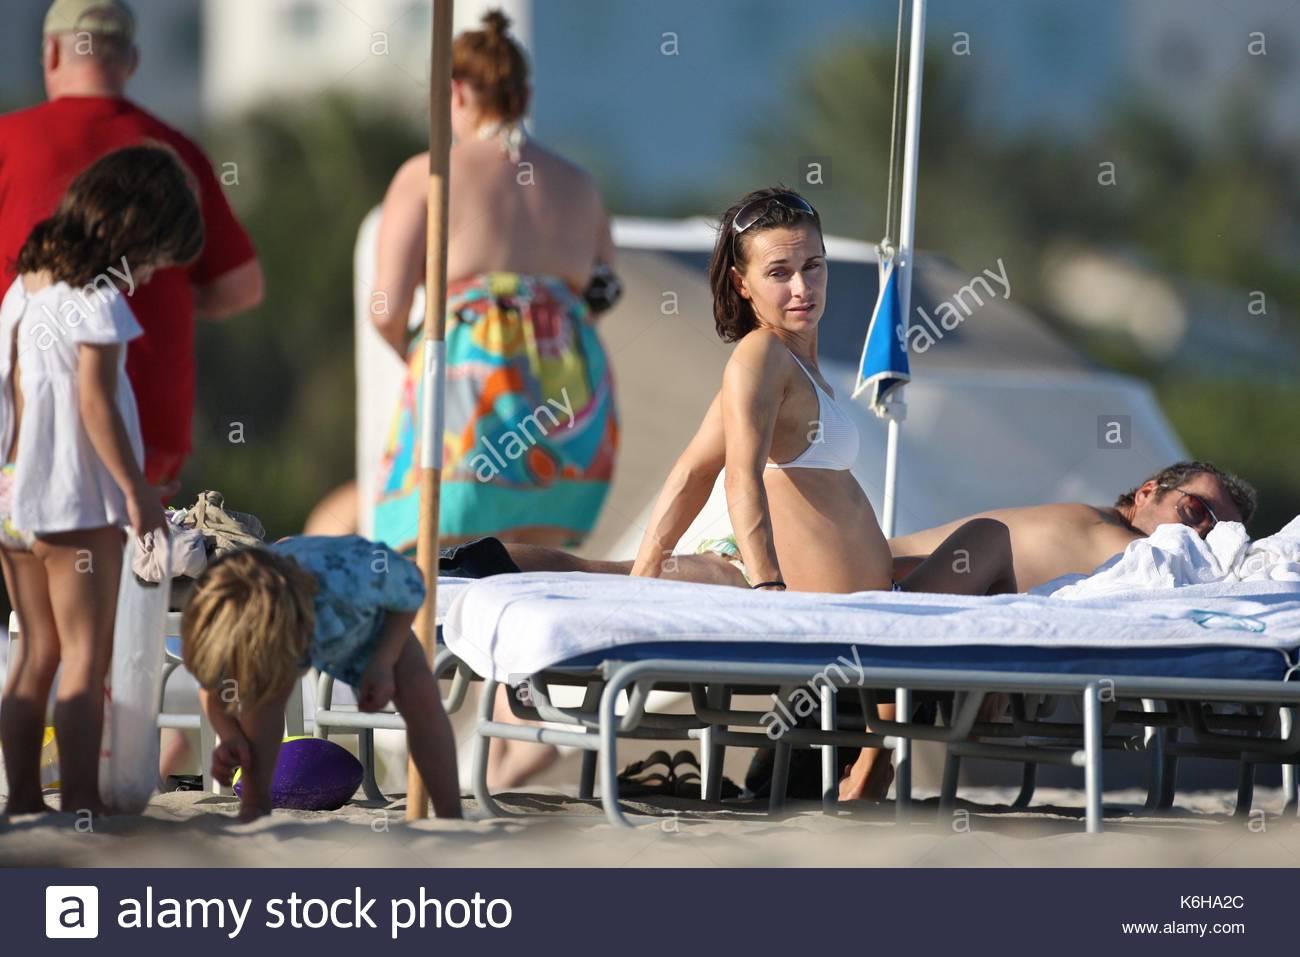 Helen Baxendale (born 1970),Sofia Vassilieva born October 22, 1992 (age 26) Hot videos Selena Forrest,Alison Sweeney